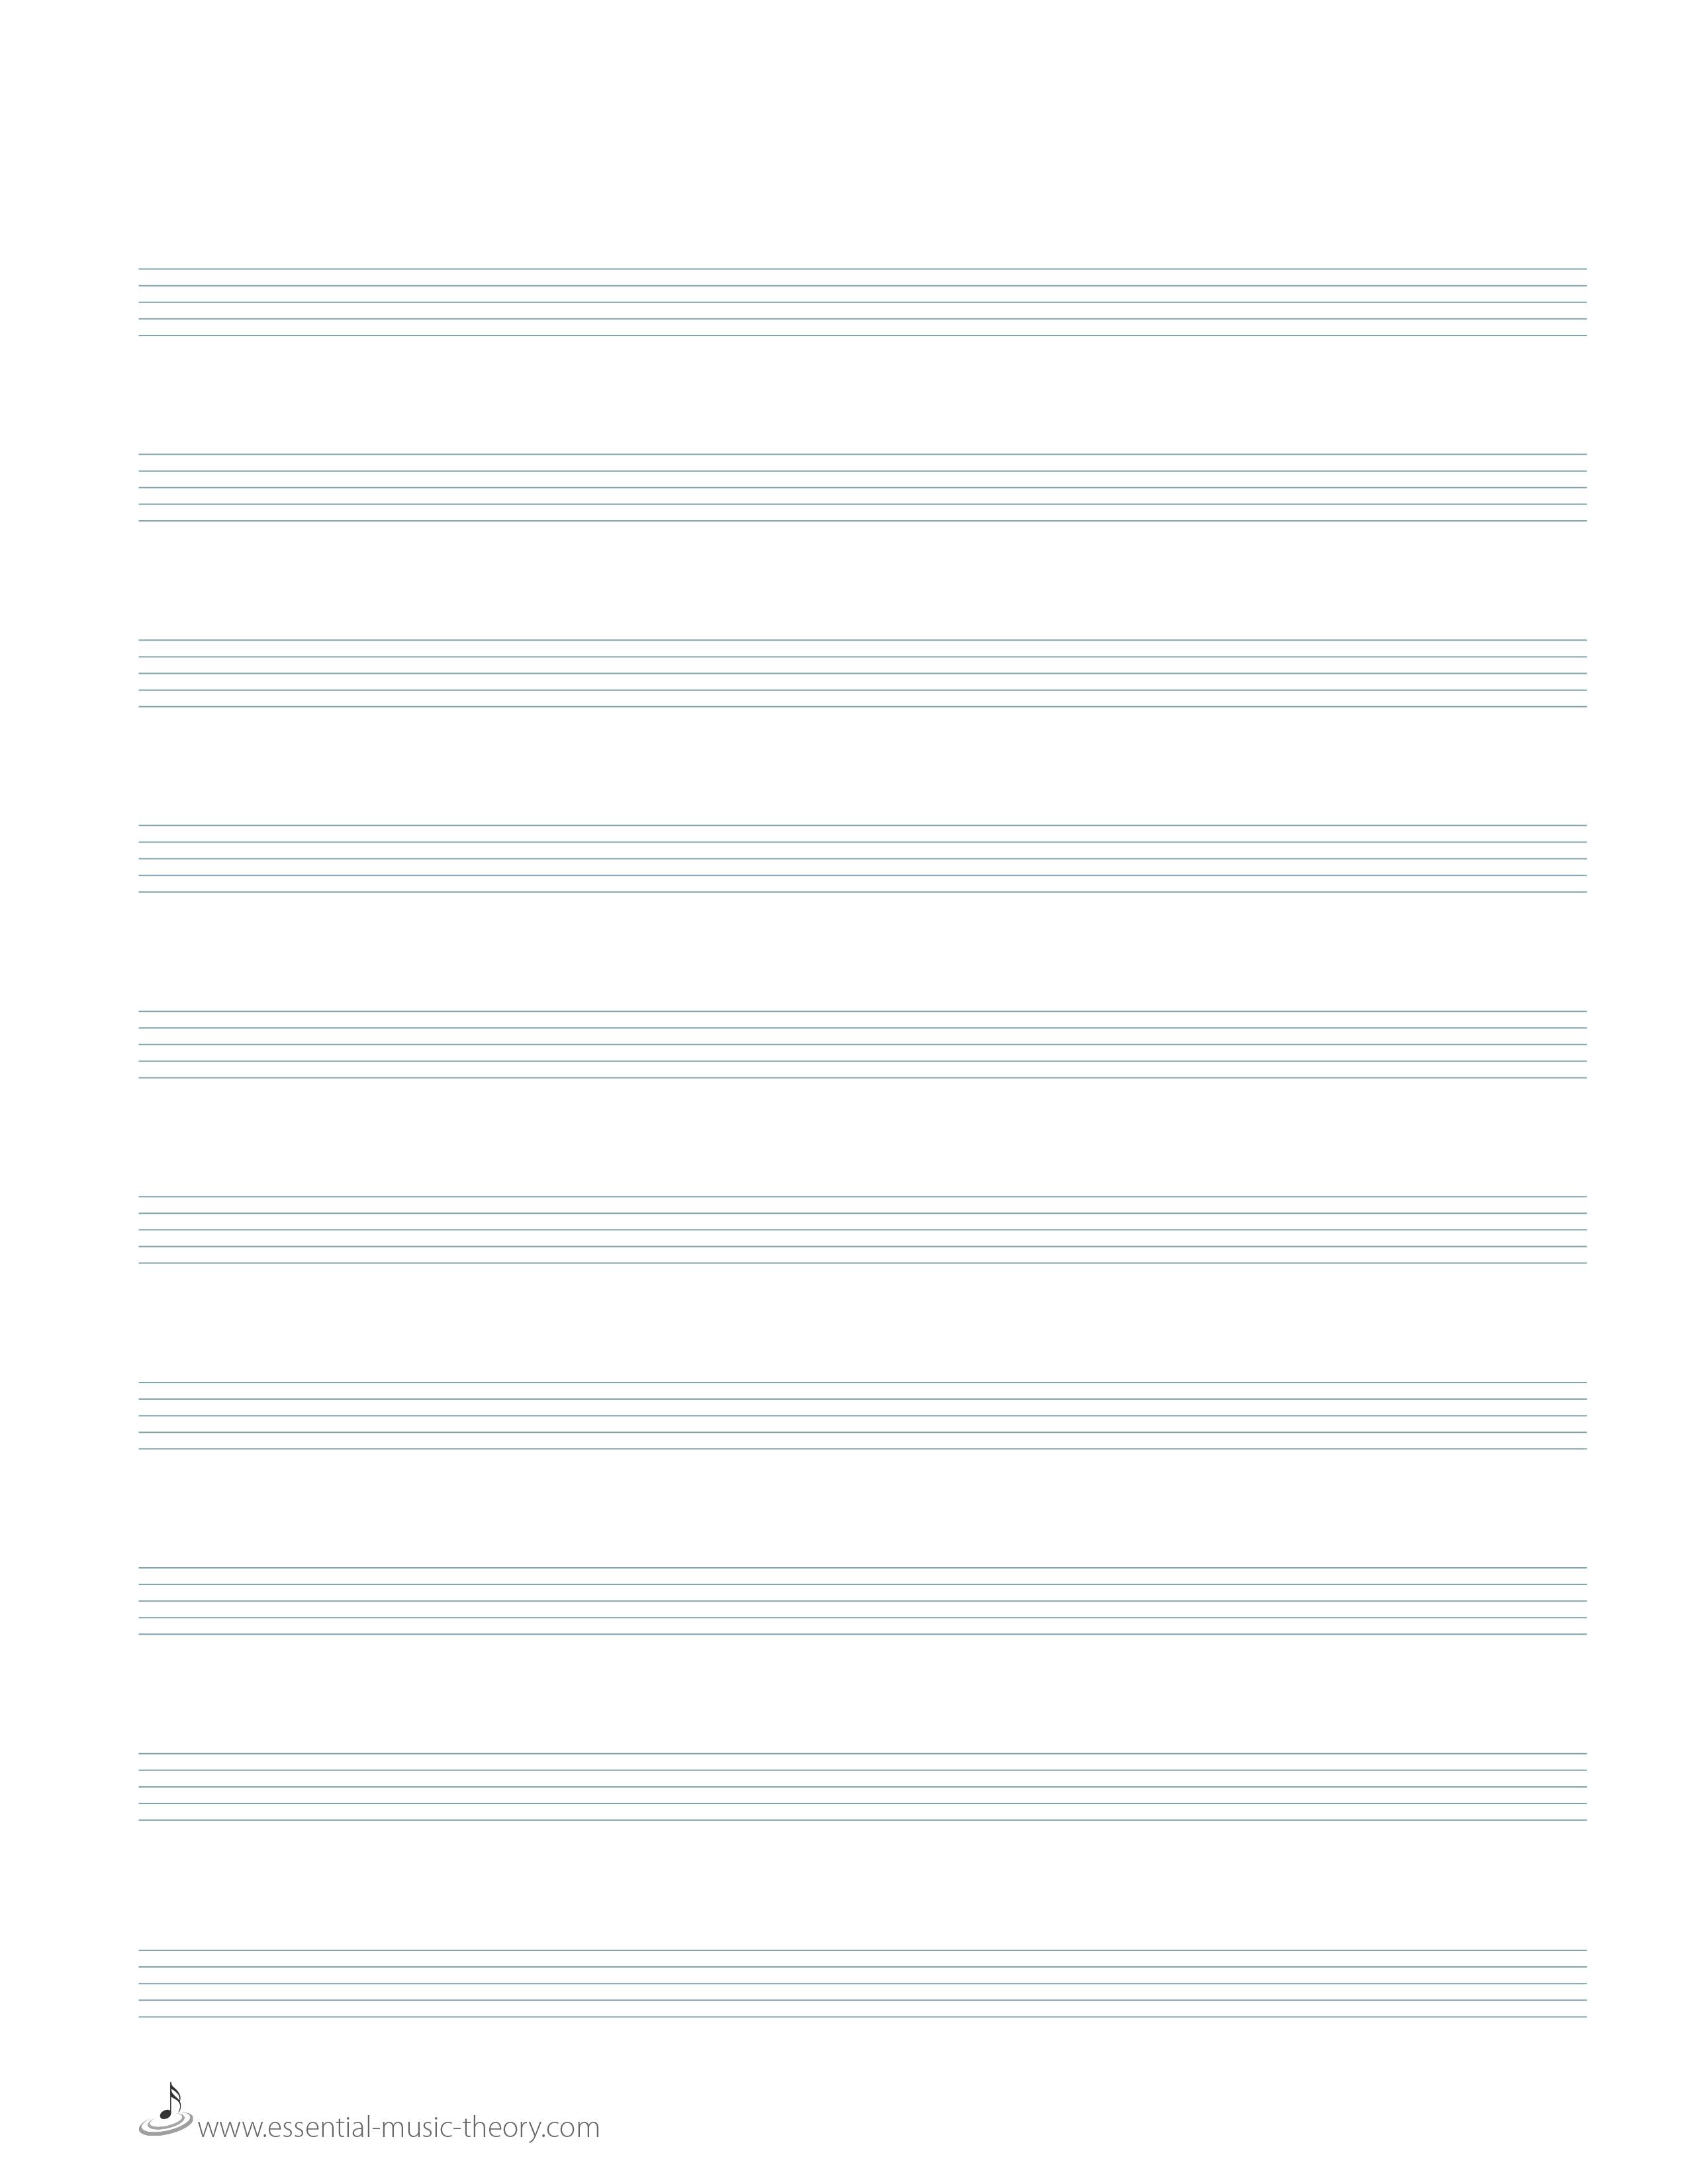 Blank Manuscript Paper - Free Printable Staff Paper